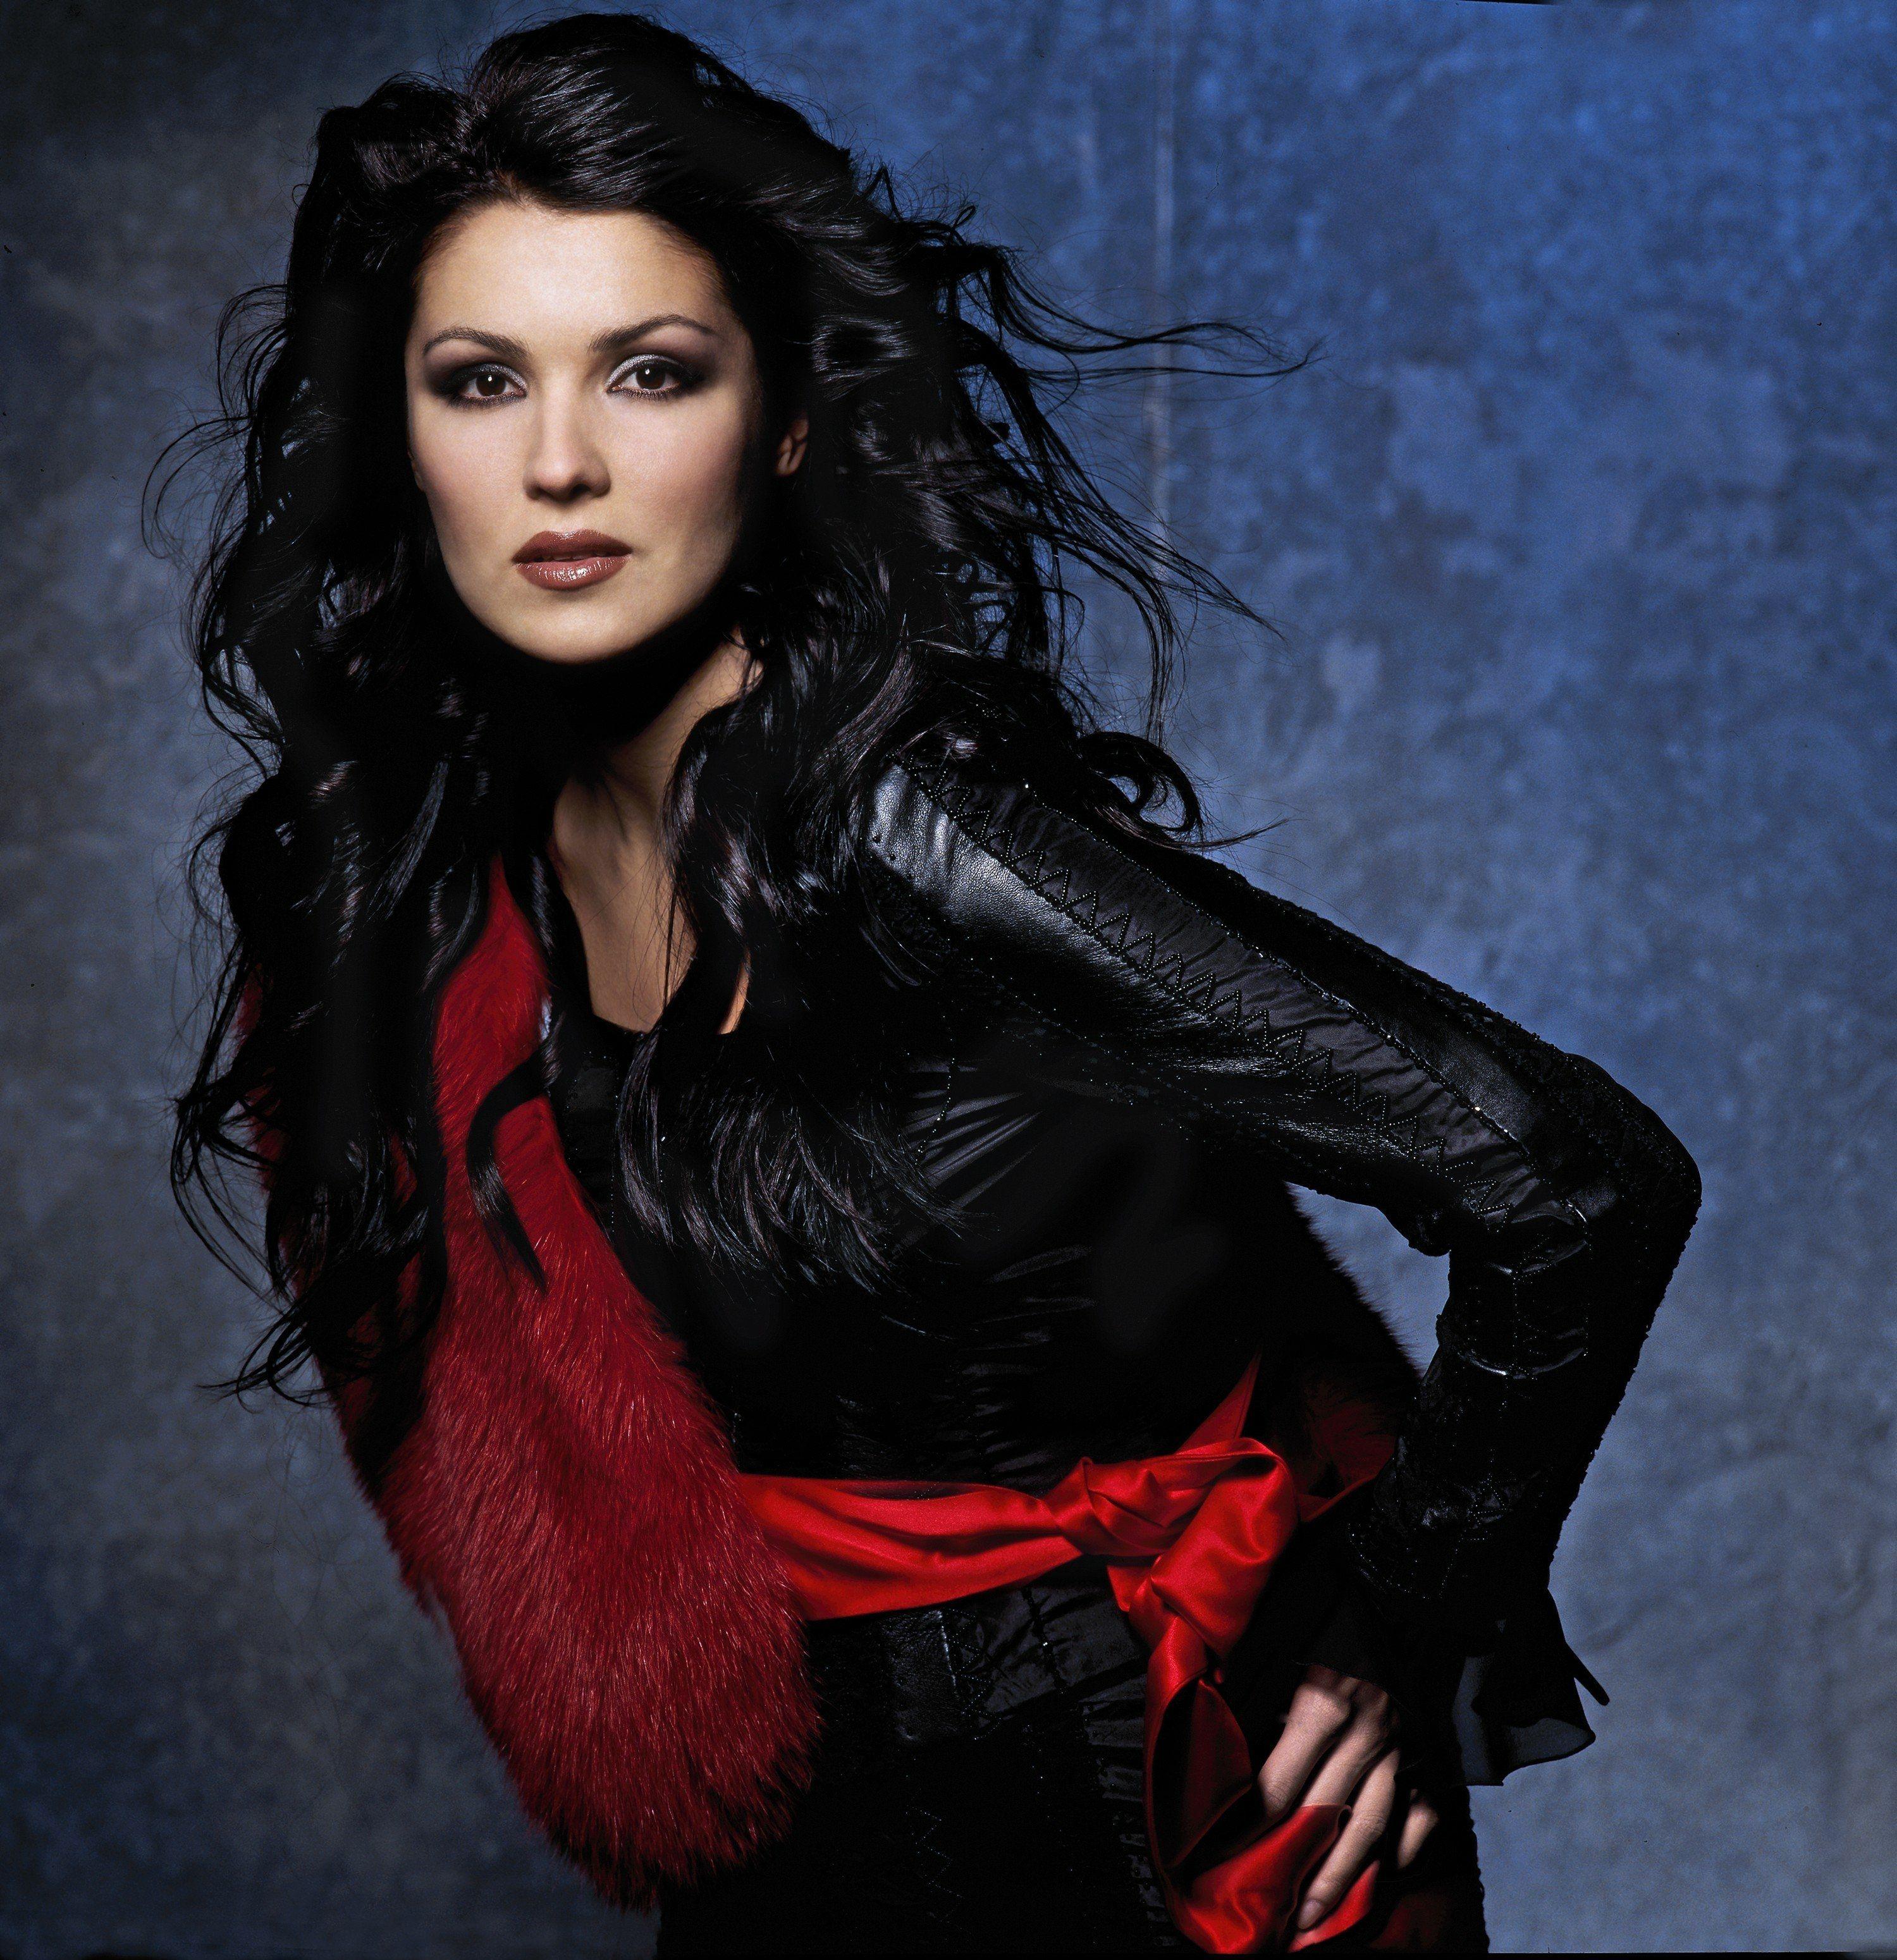 Anna netrebko world opera megastar is judiciously named as the reigning new diva of the 21st - Anna netrebko casta diva ...